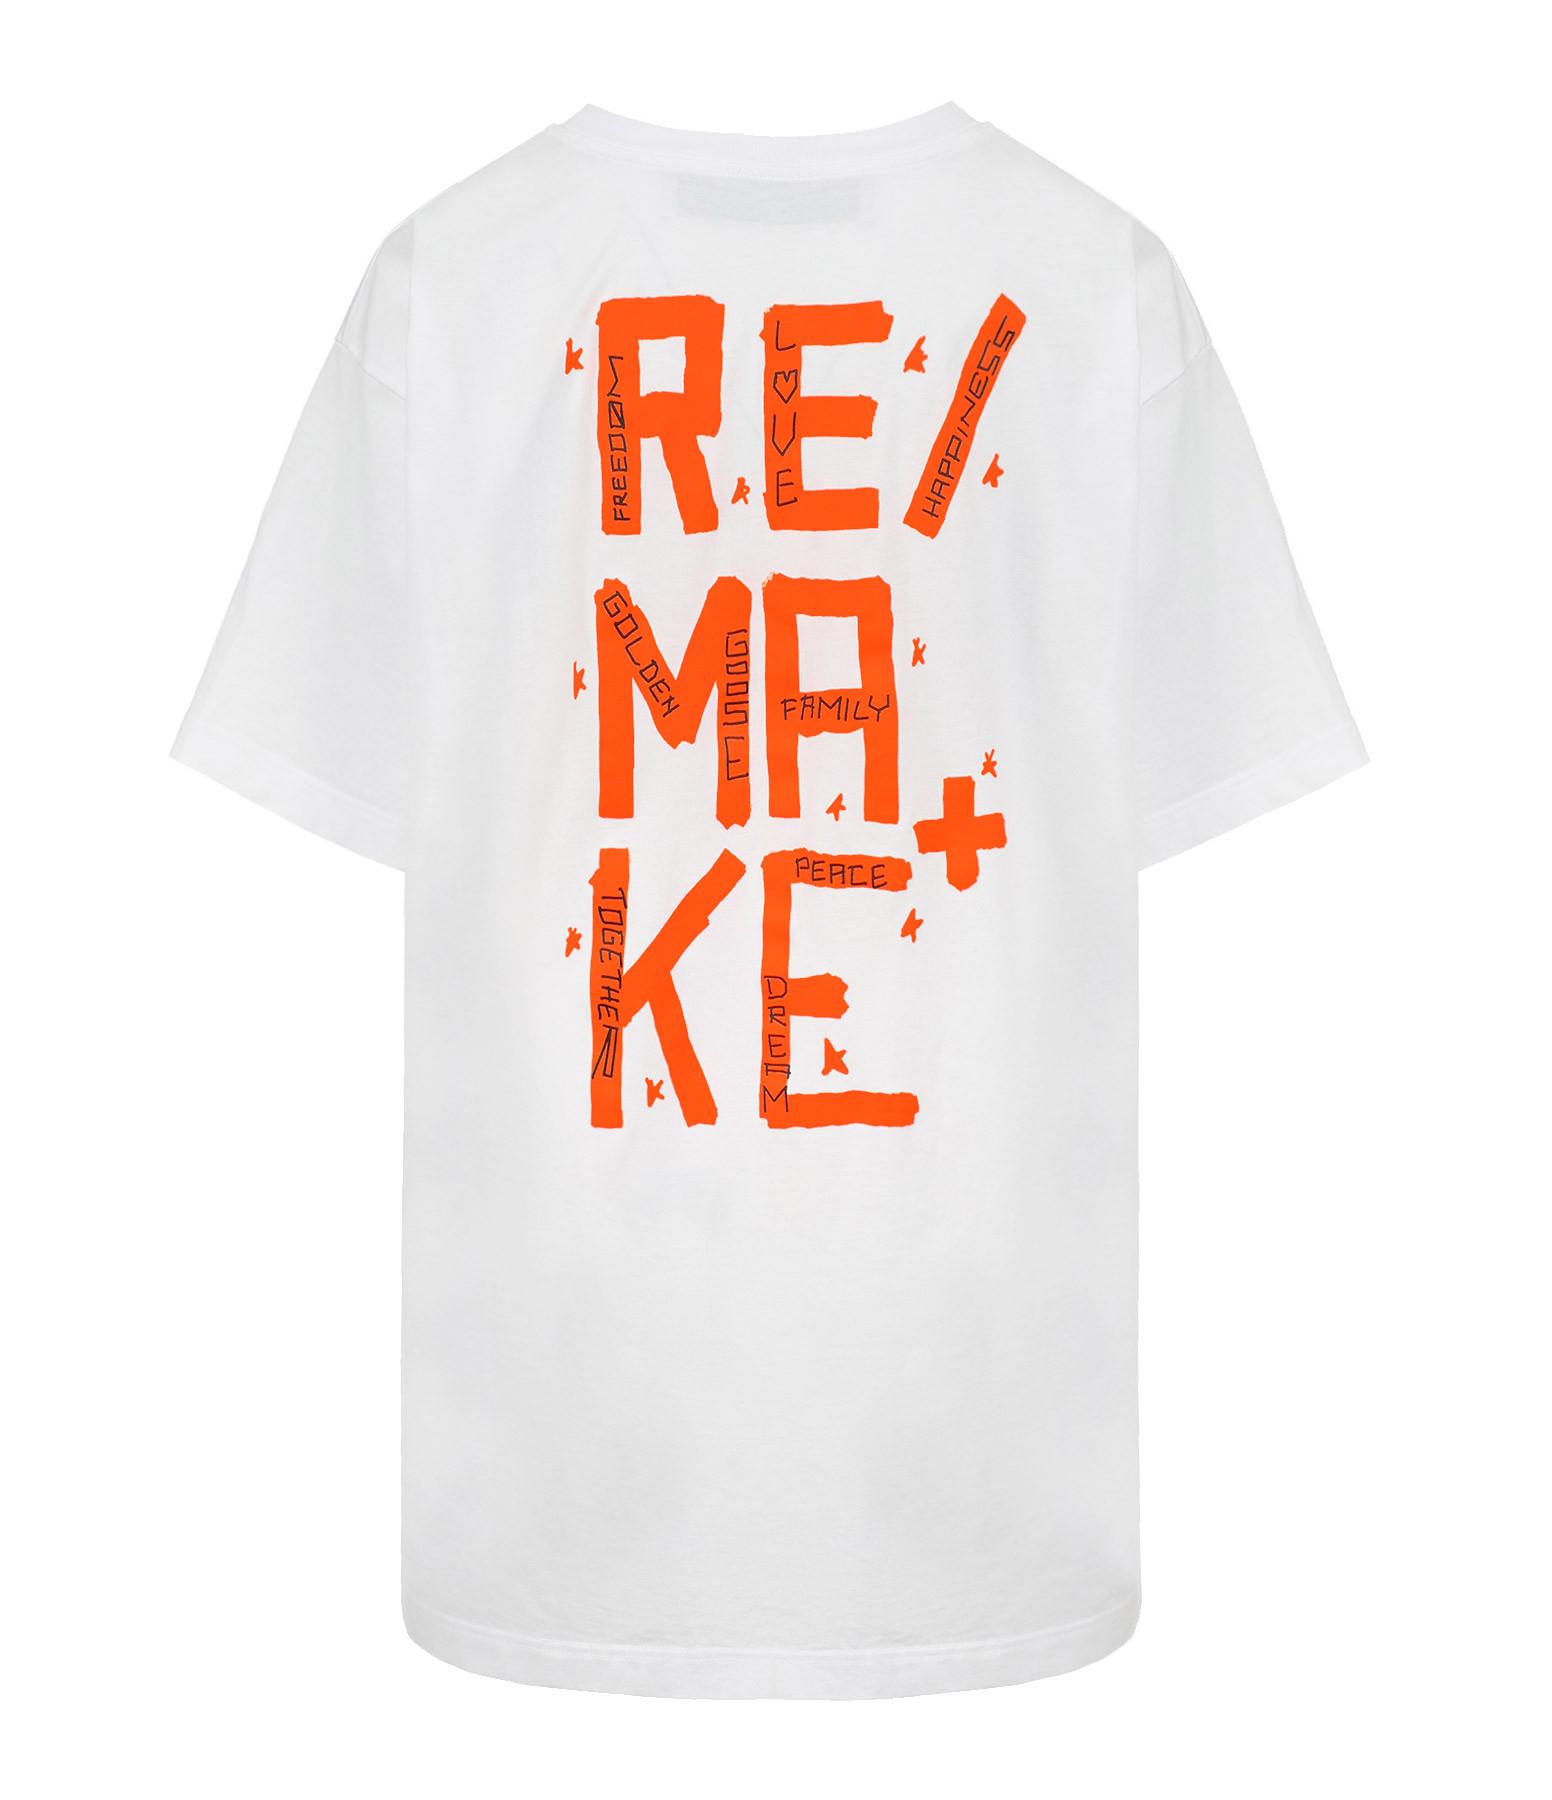 GOLDEN GOOSE - Tee-shirt Homme Artu Remake Coton Blanc Orange